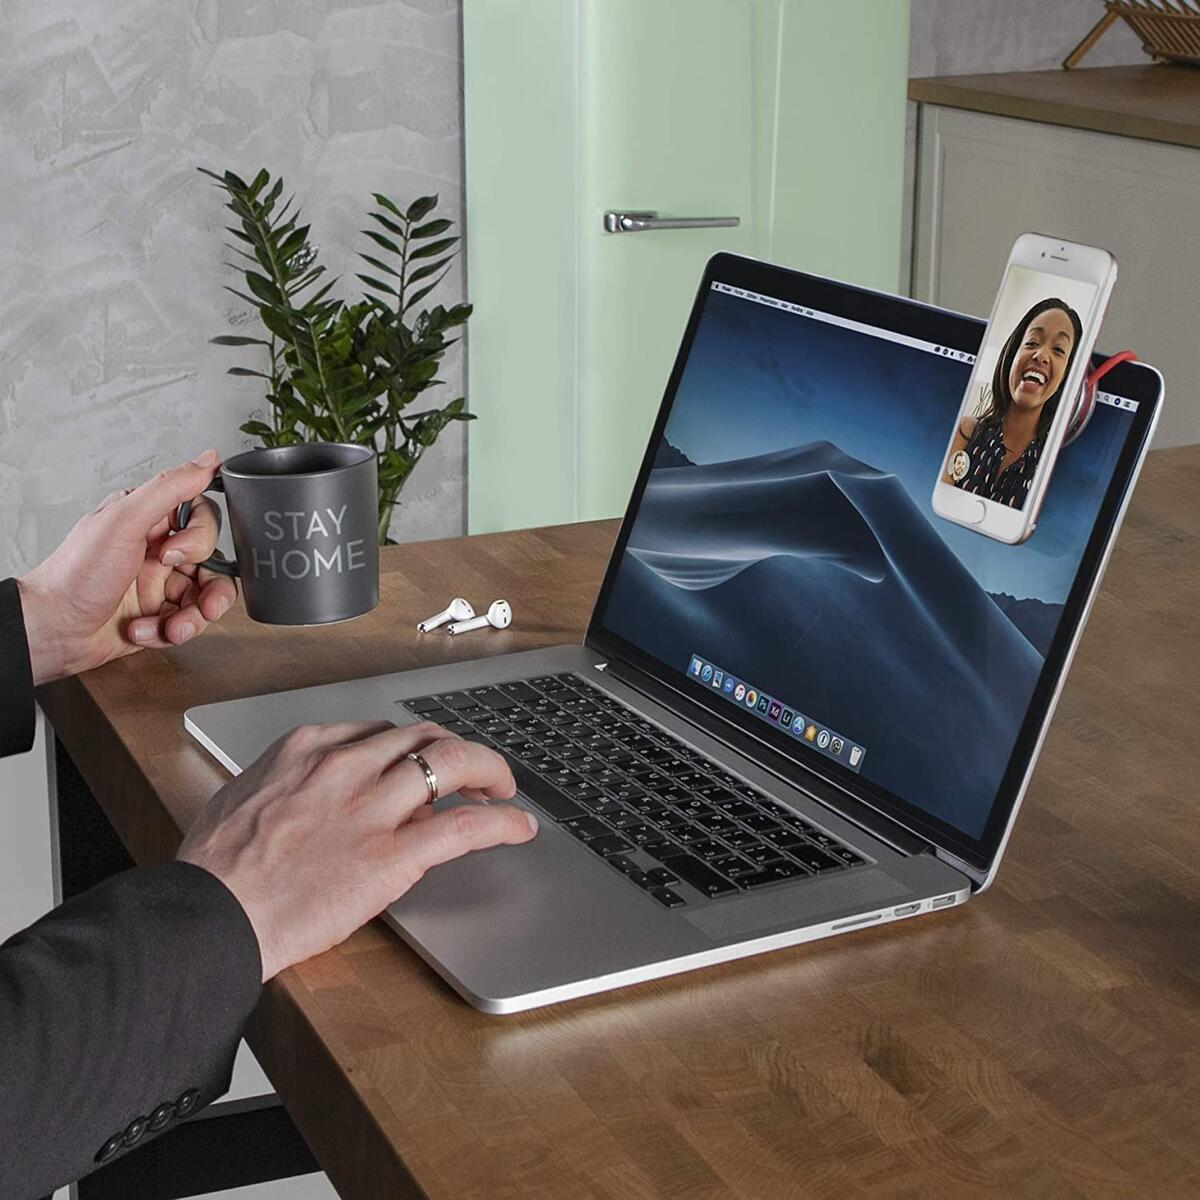 IMStick Magnetic Cell Phone Stands - Phone Holder for Desk Car GYM Bedroom Office Home (Color Silver)